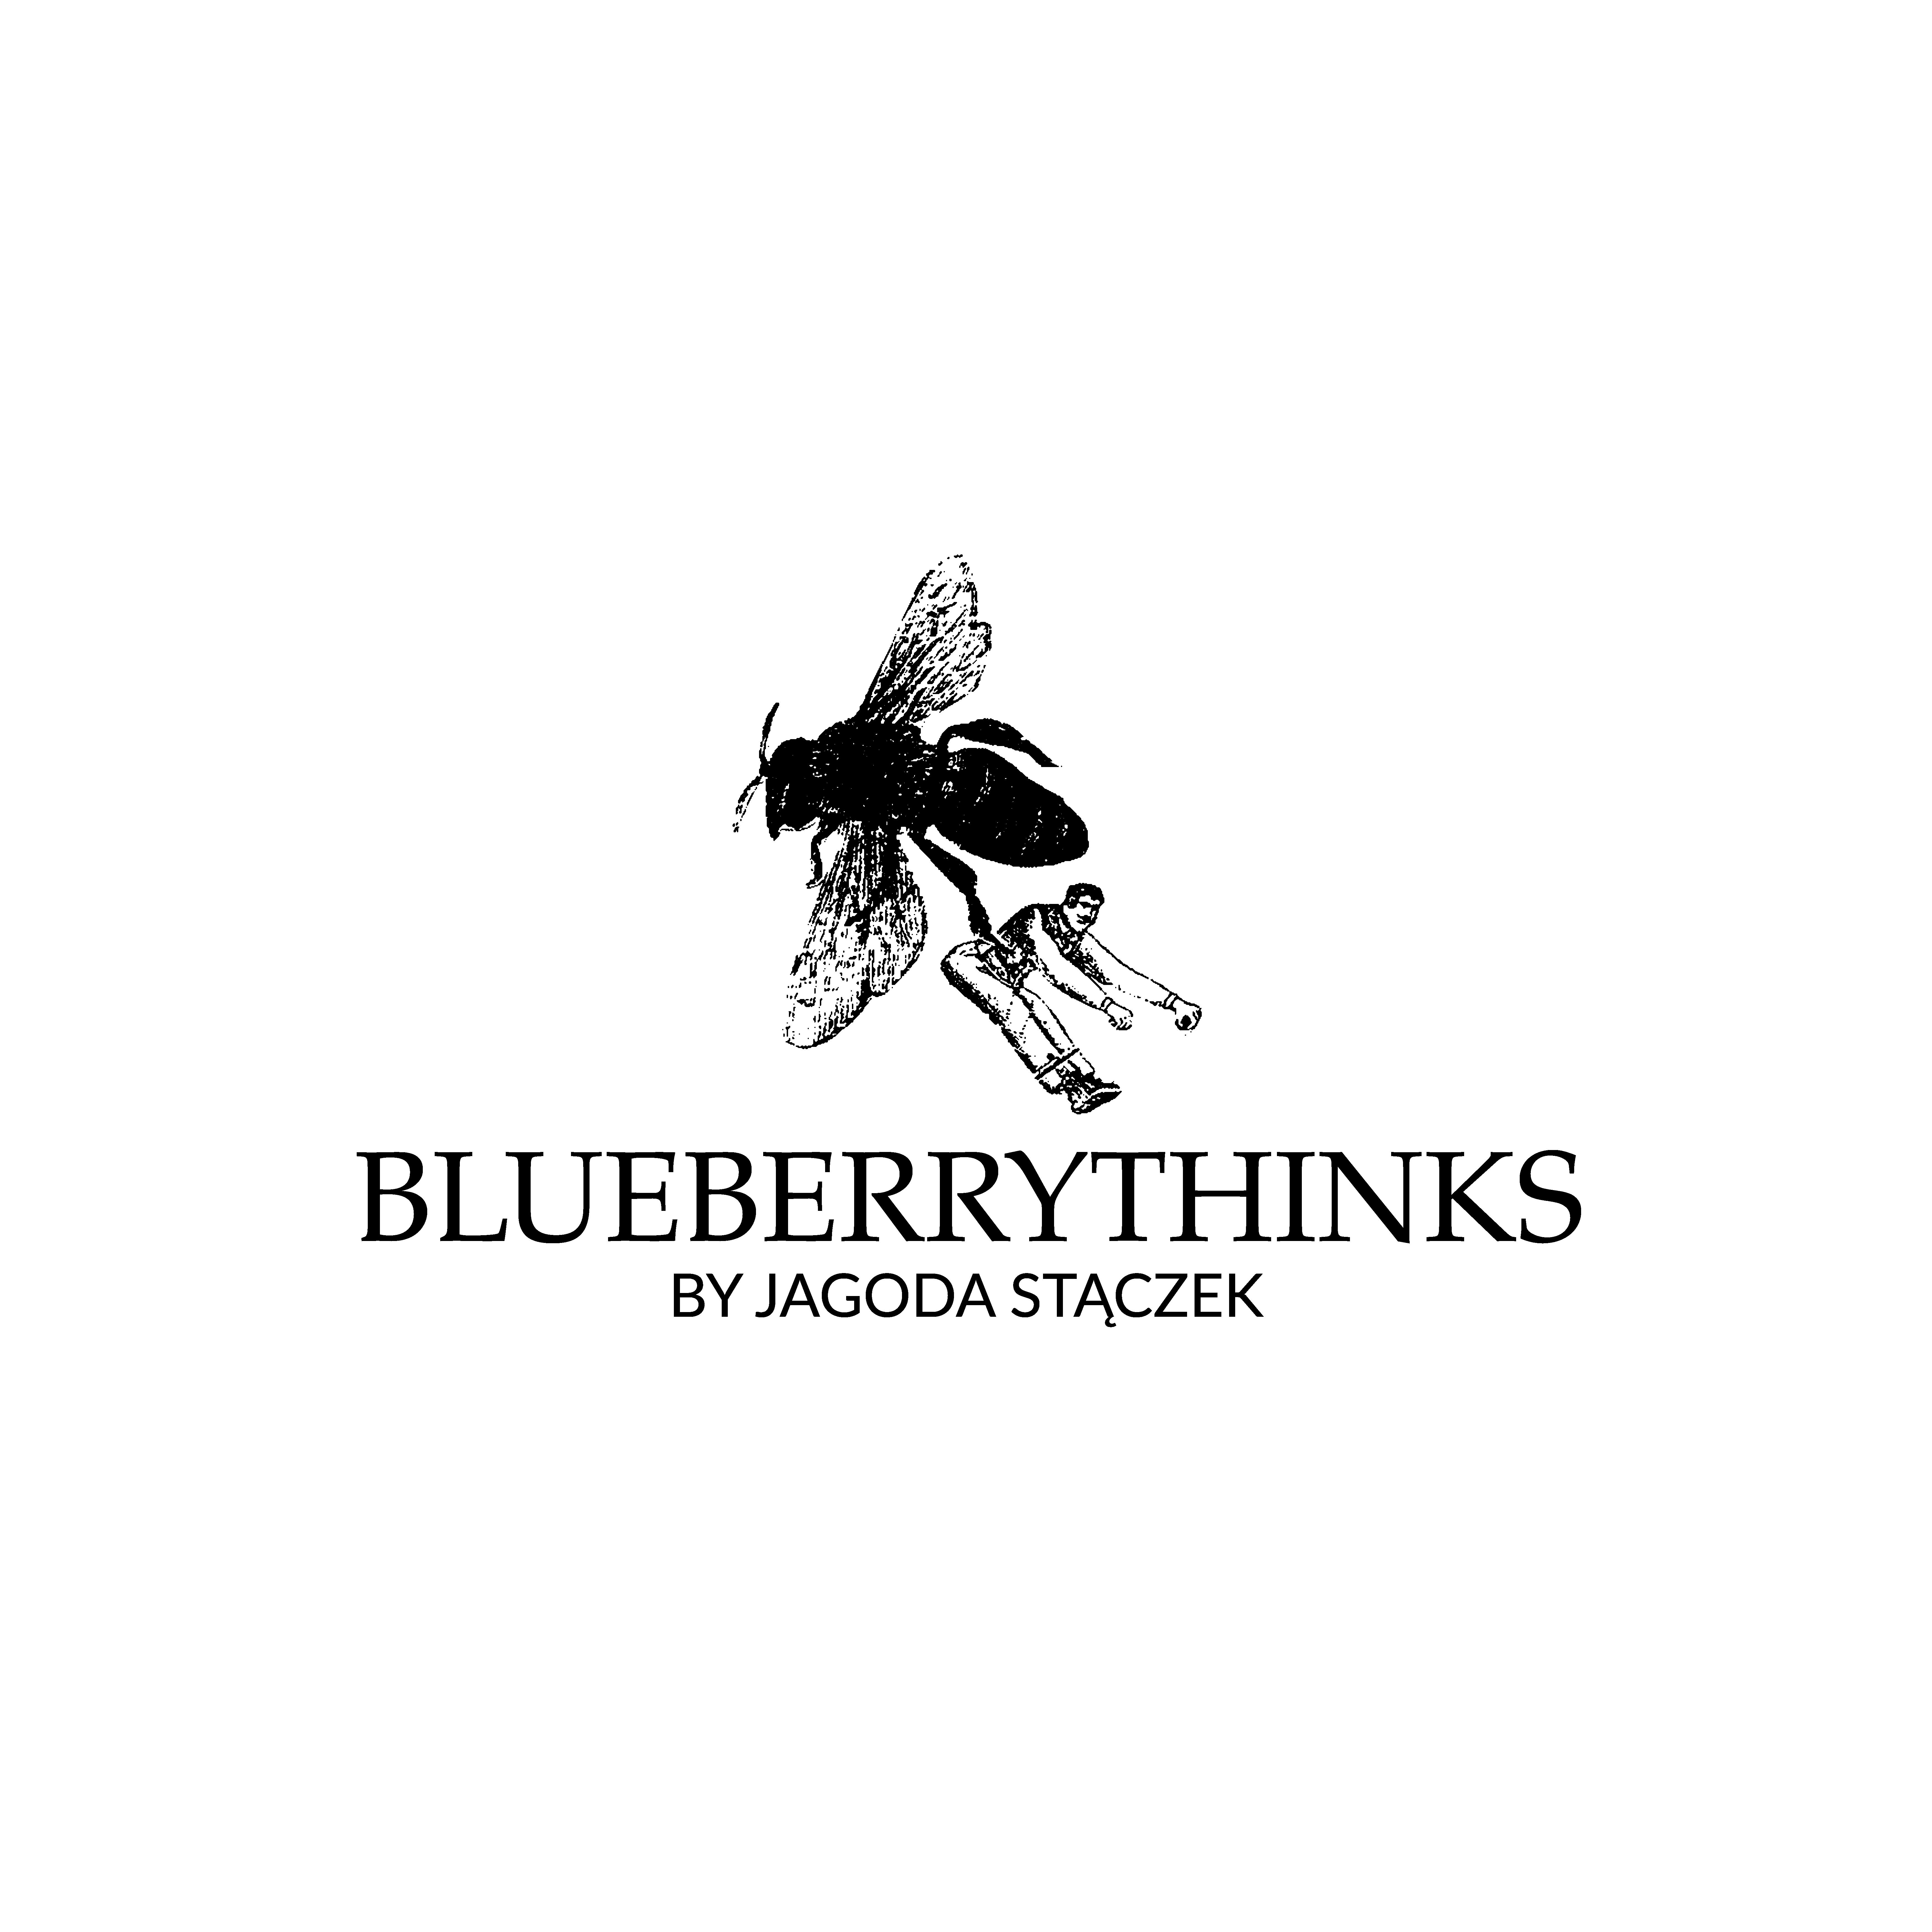 Jagoda Stączek